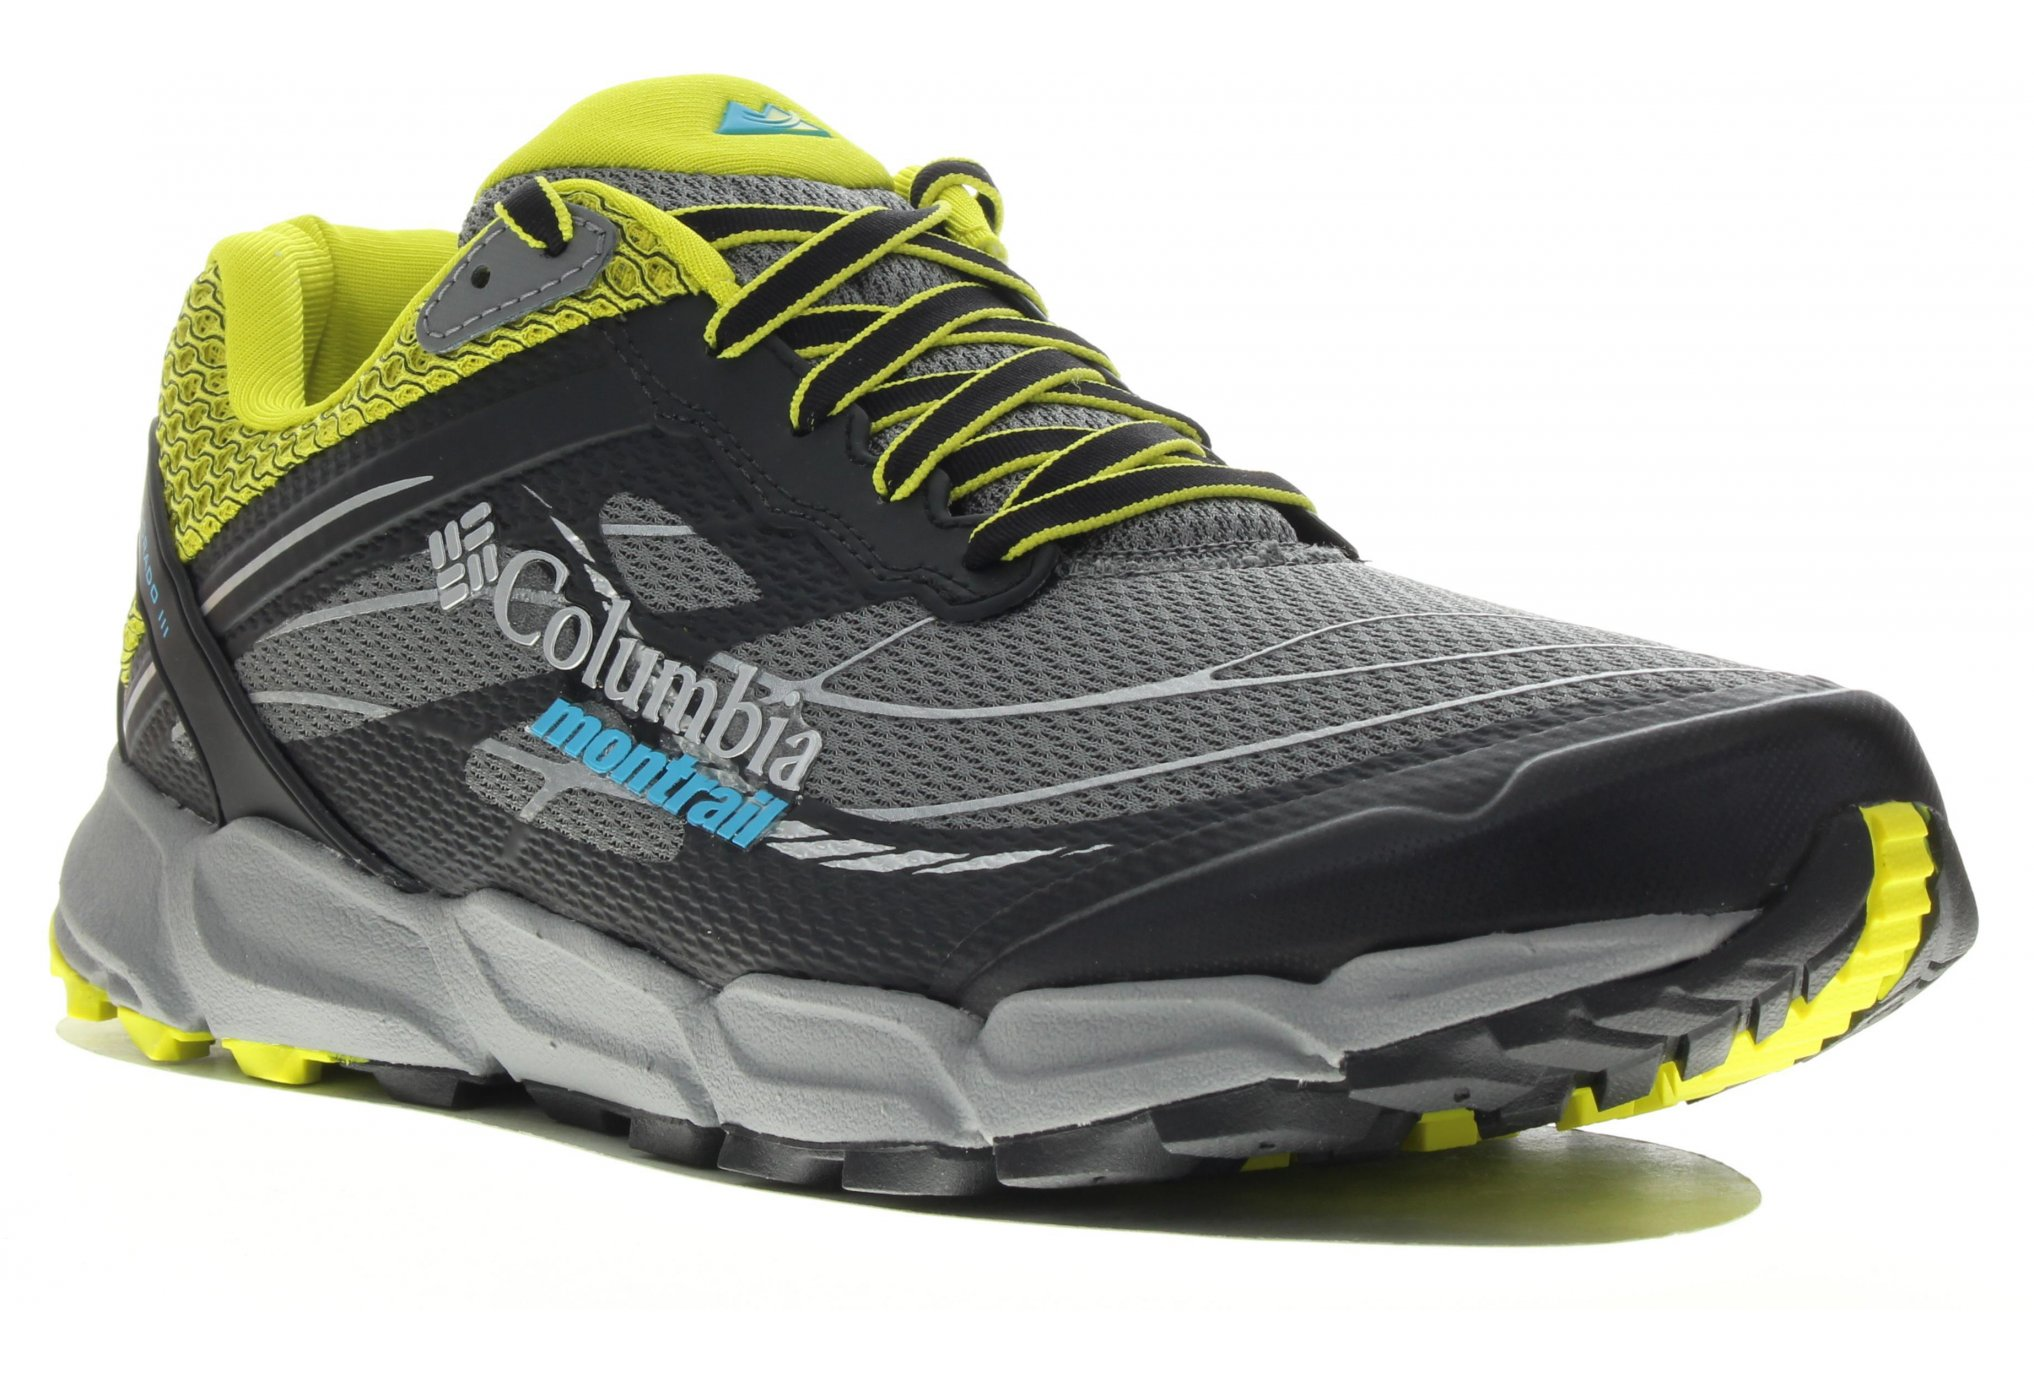 Columbia M Caldorado Endurance Mag Homme Iii Chaussures Trails nX8P0wOk